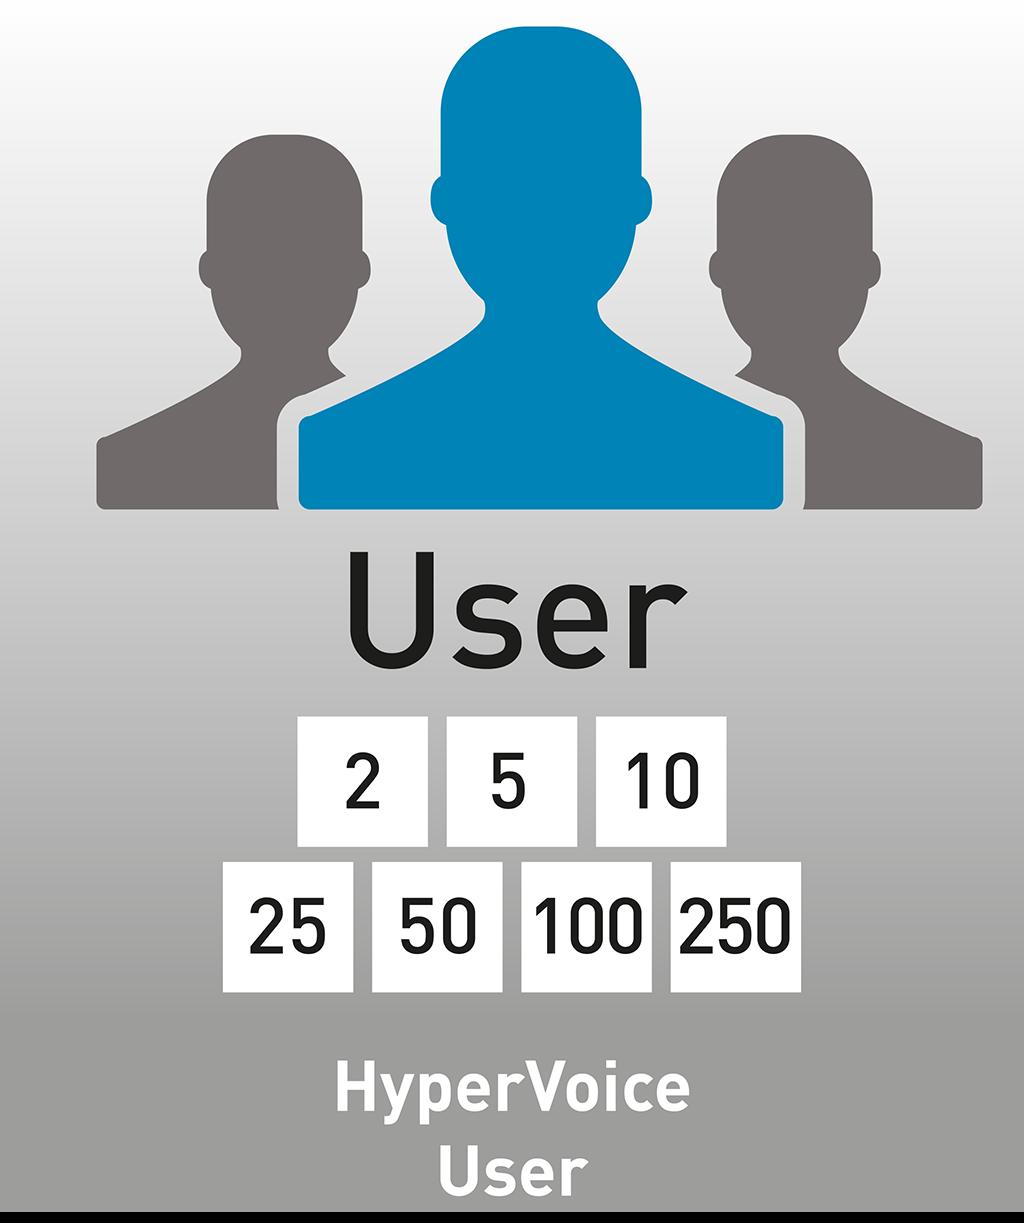 Logo der AGFEO HyperVoice User Lizenz